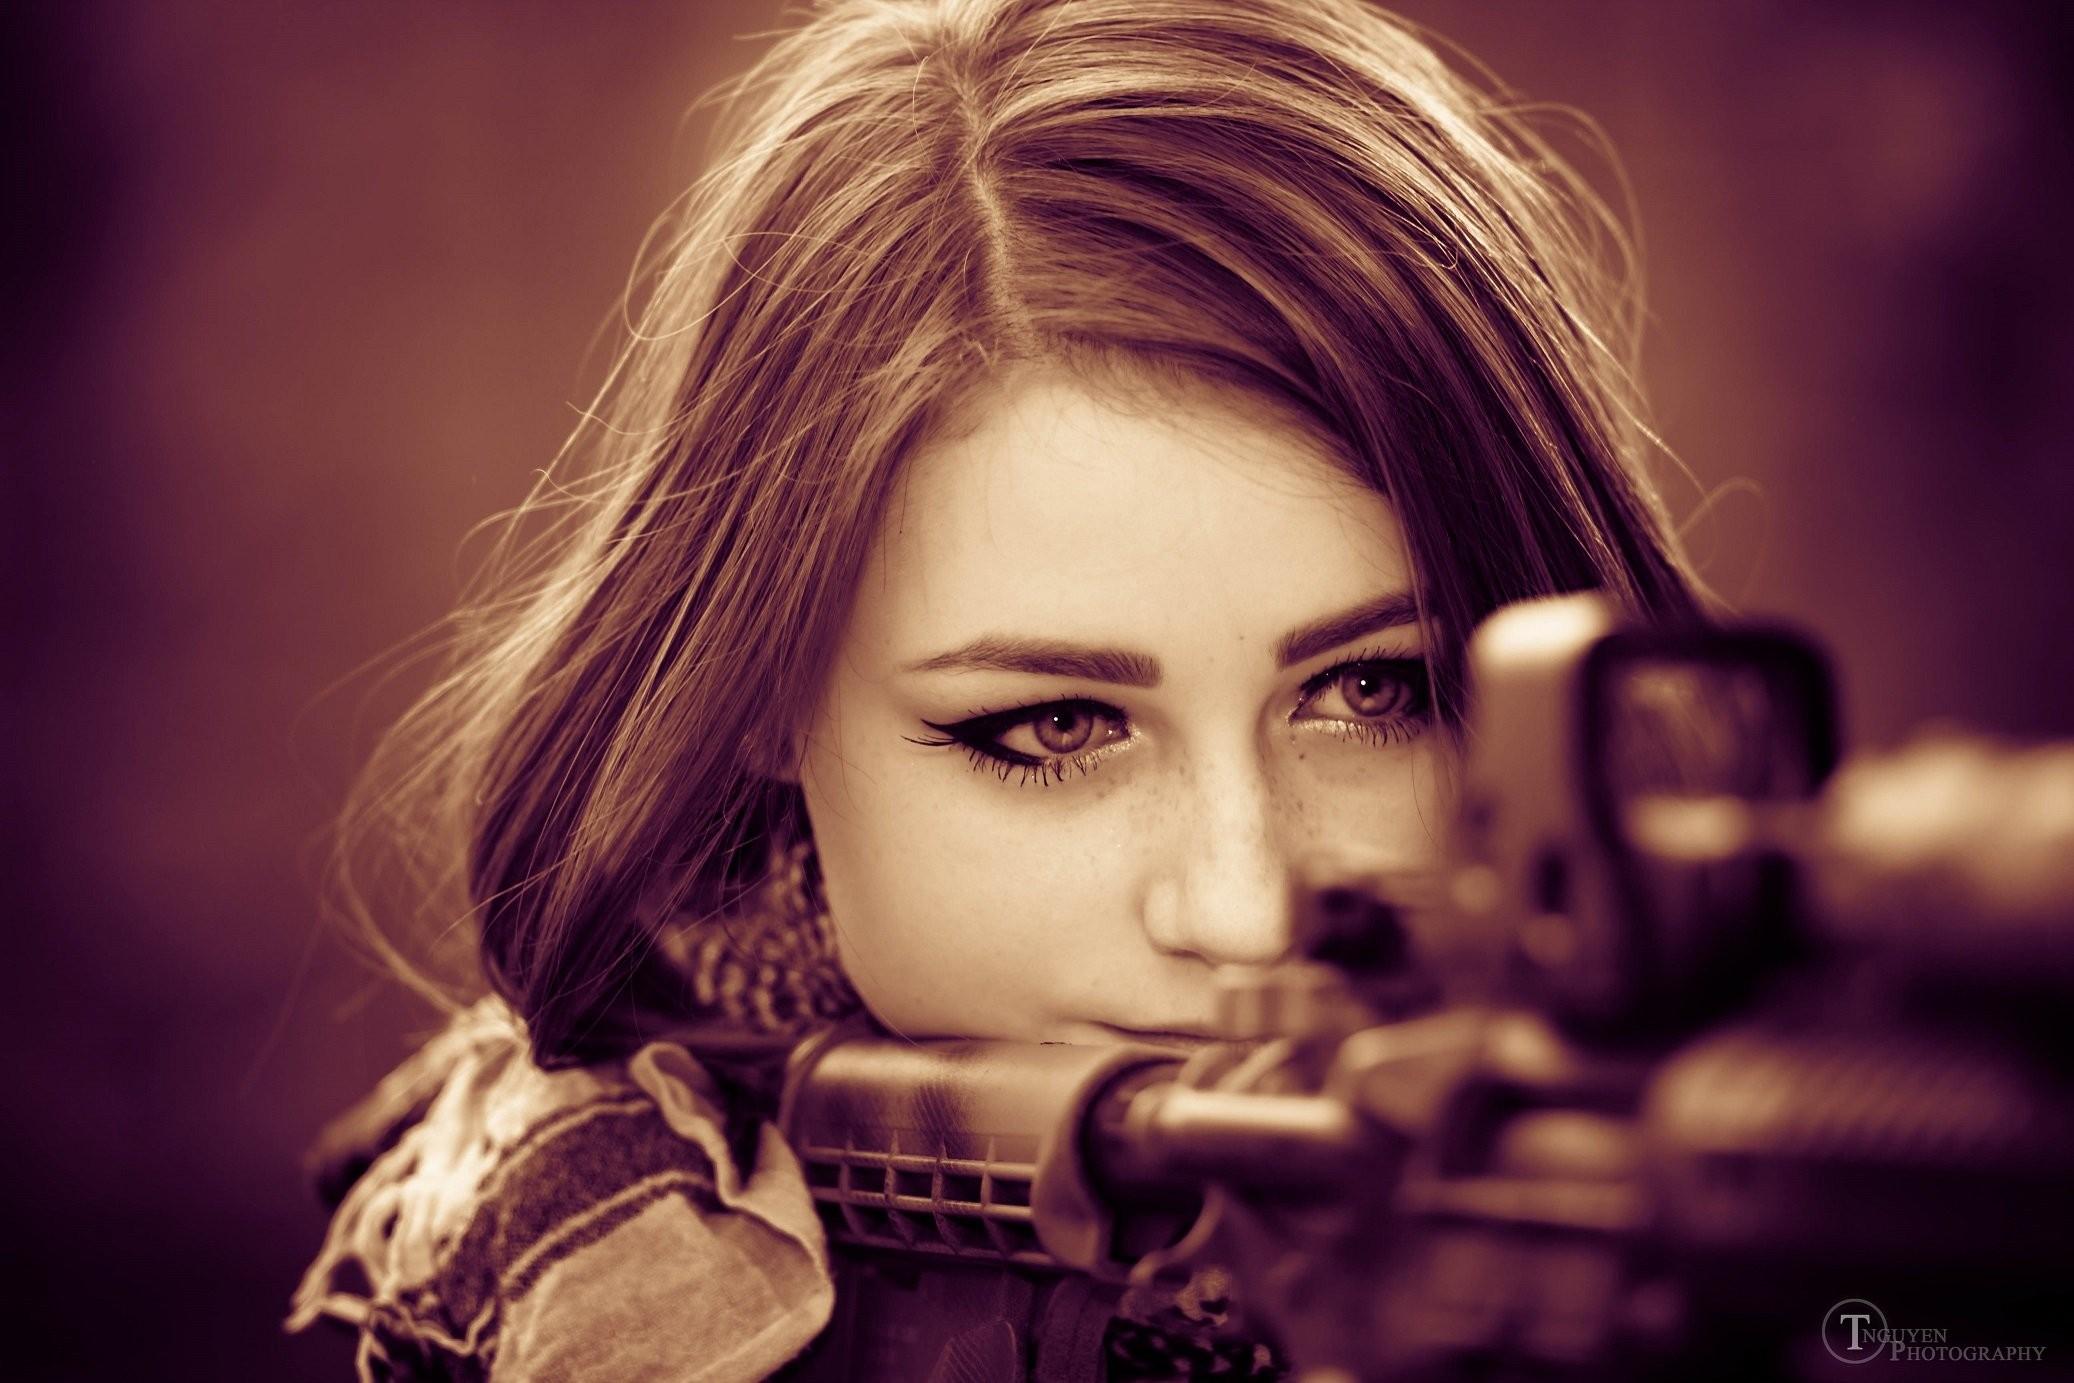 99 Chicas Armas Fondos De Pantalla Hd Fondos De